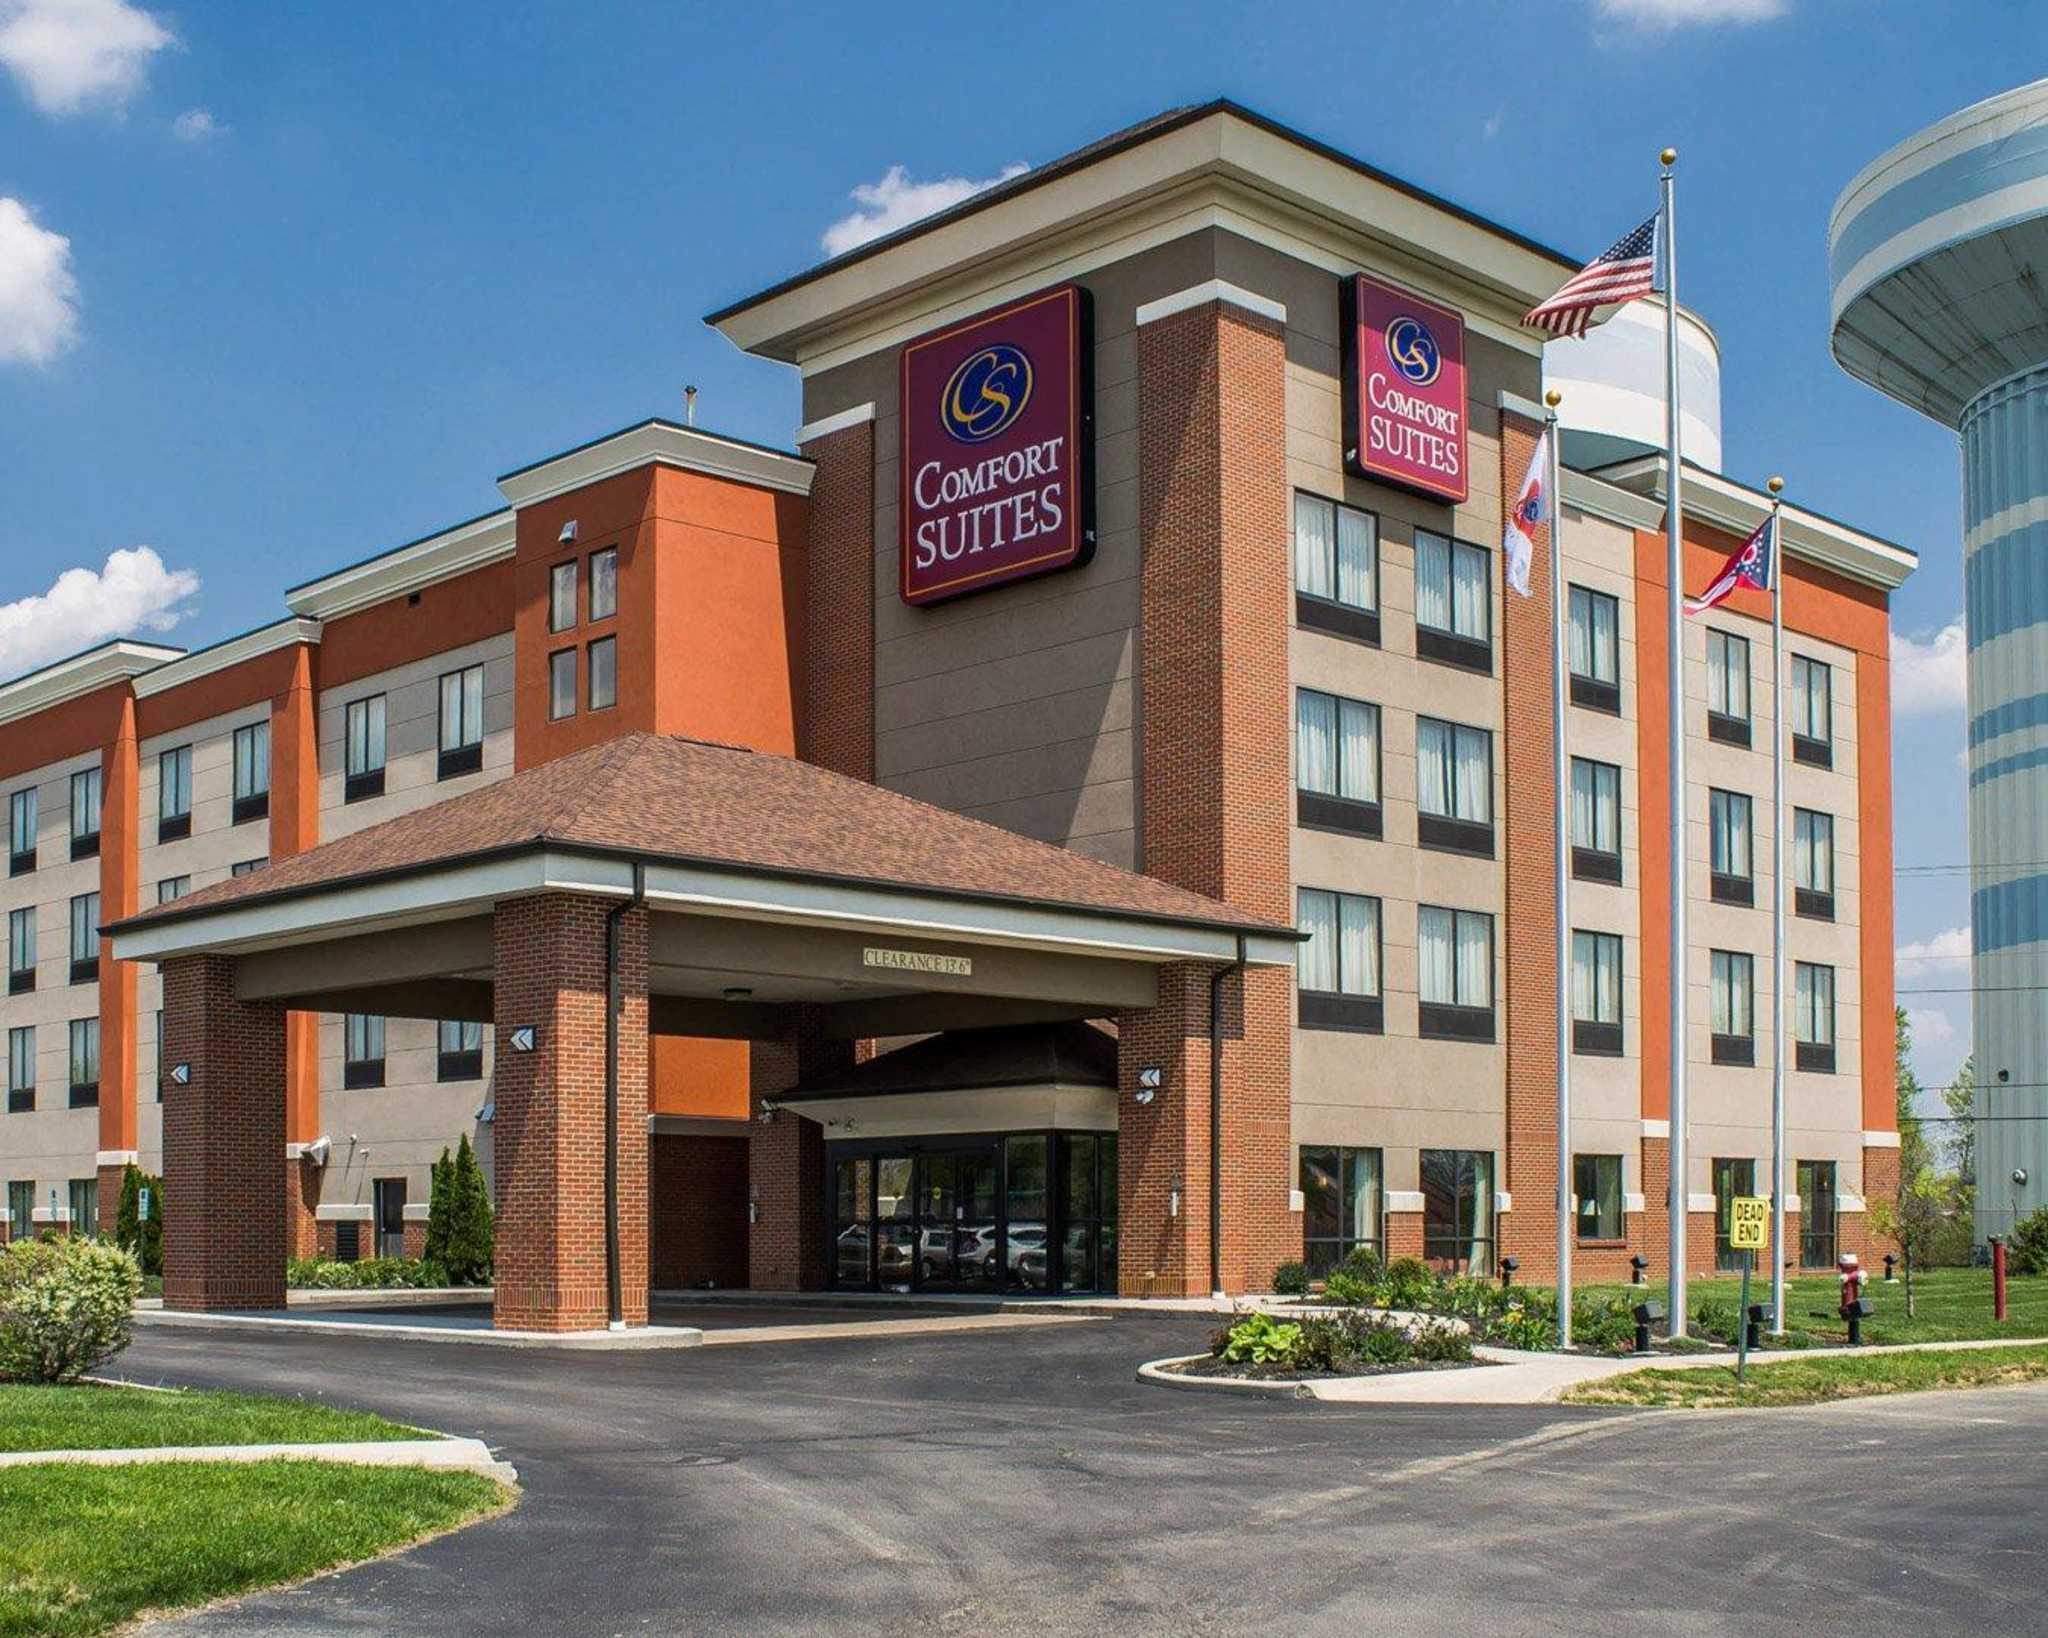 Comfort Suites East Broad at 270 image 0